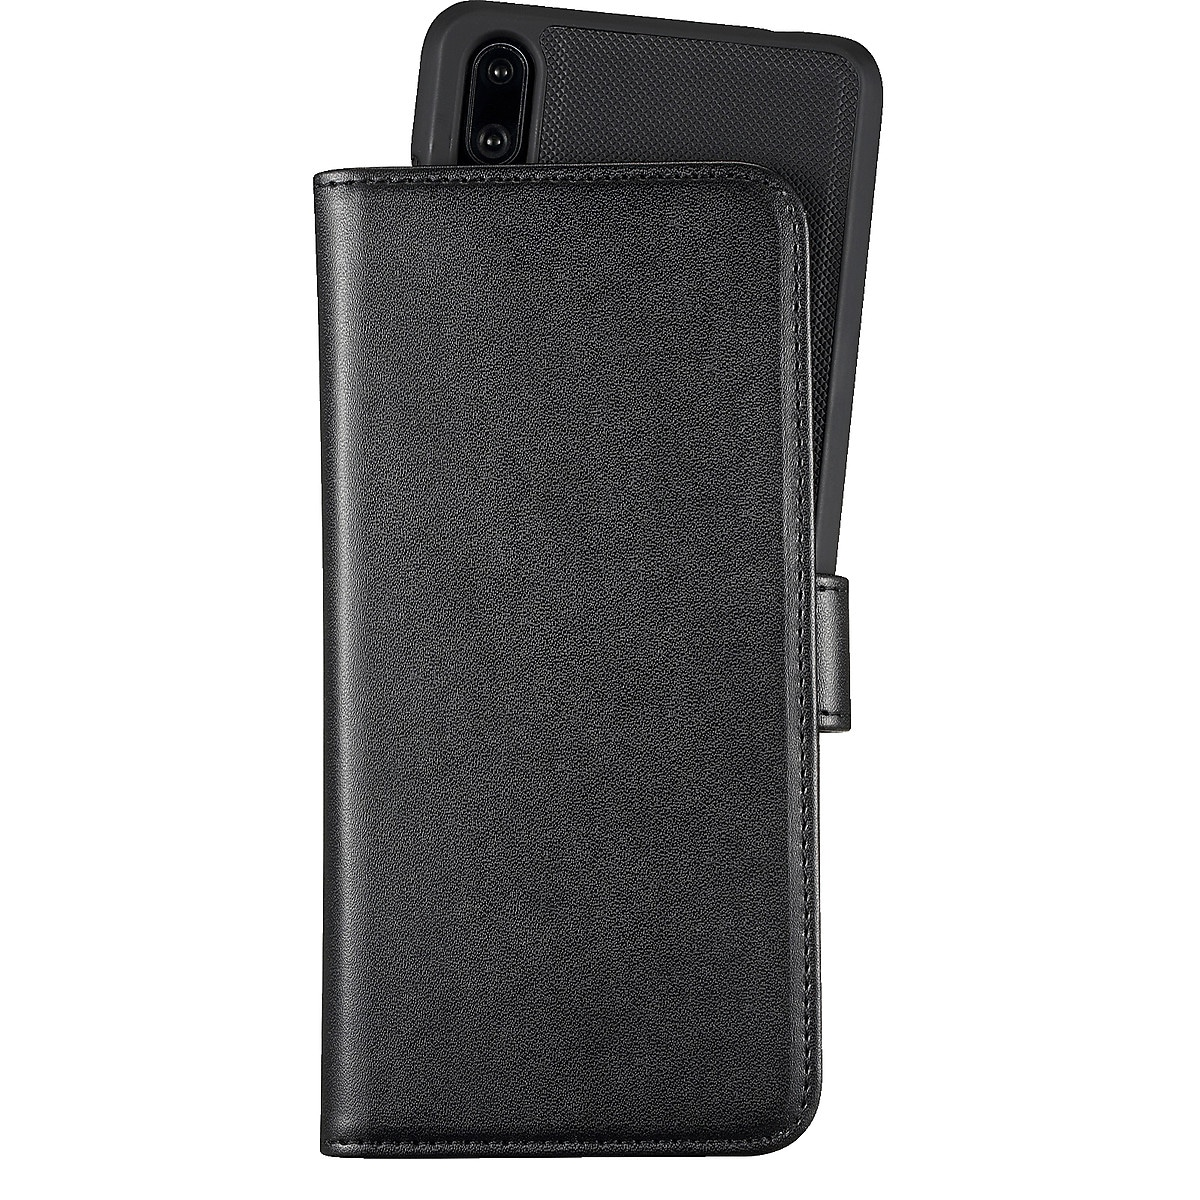 Plånboksfodral för Huawei P20 Pro, Holdit